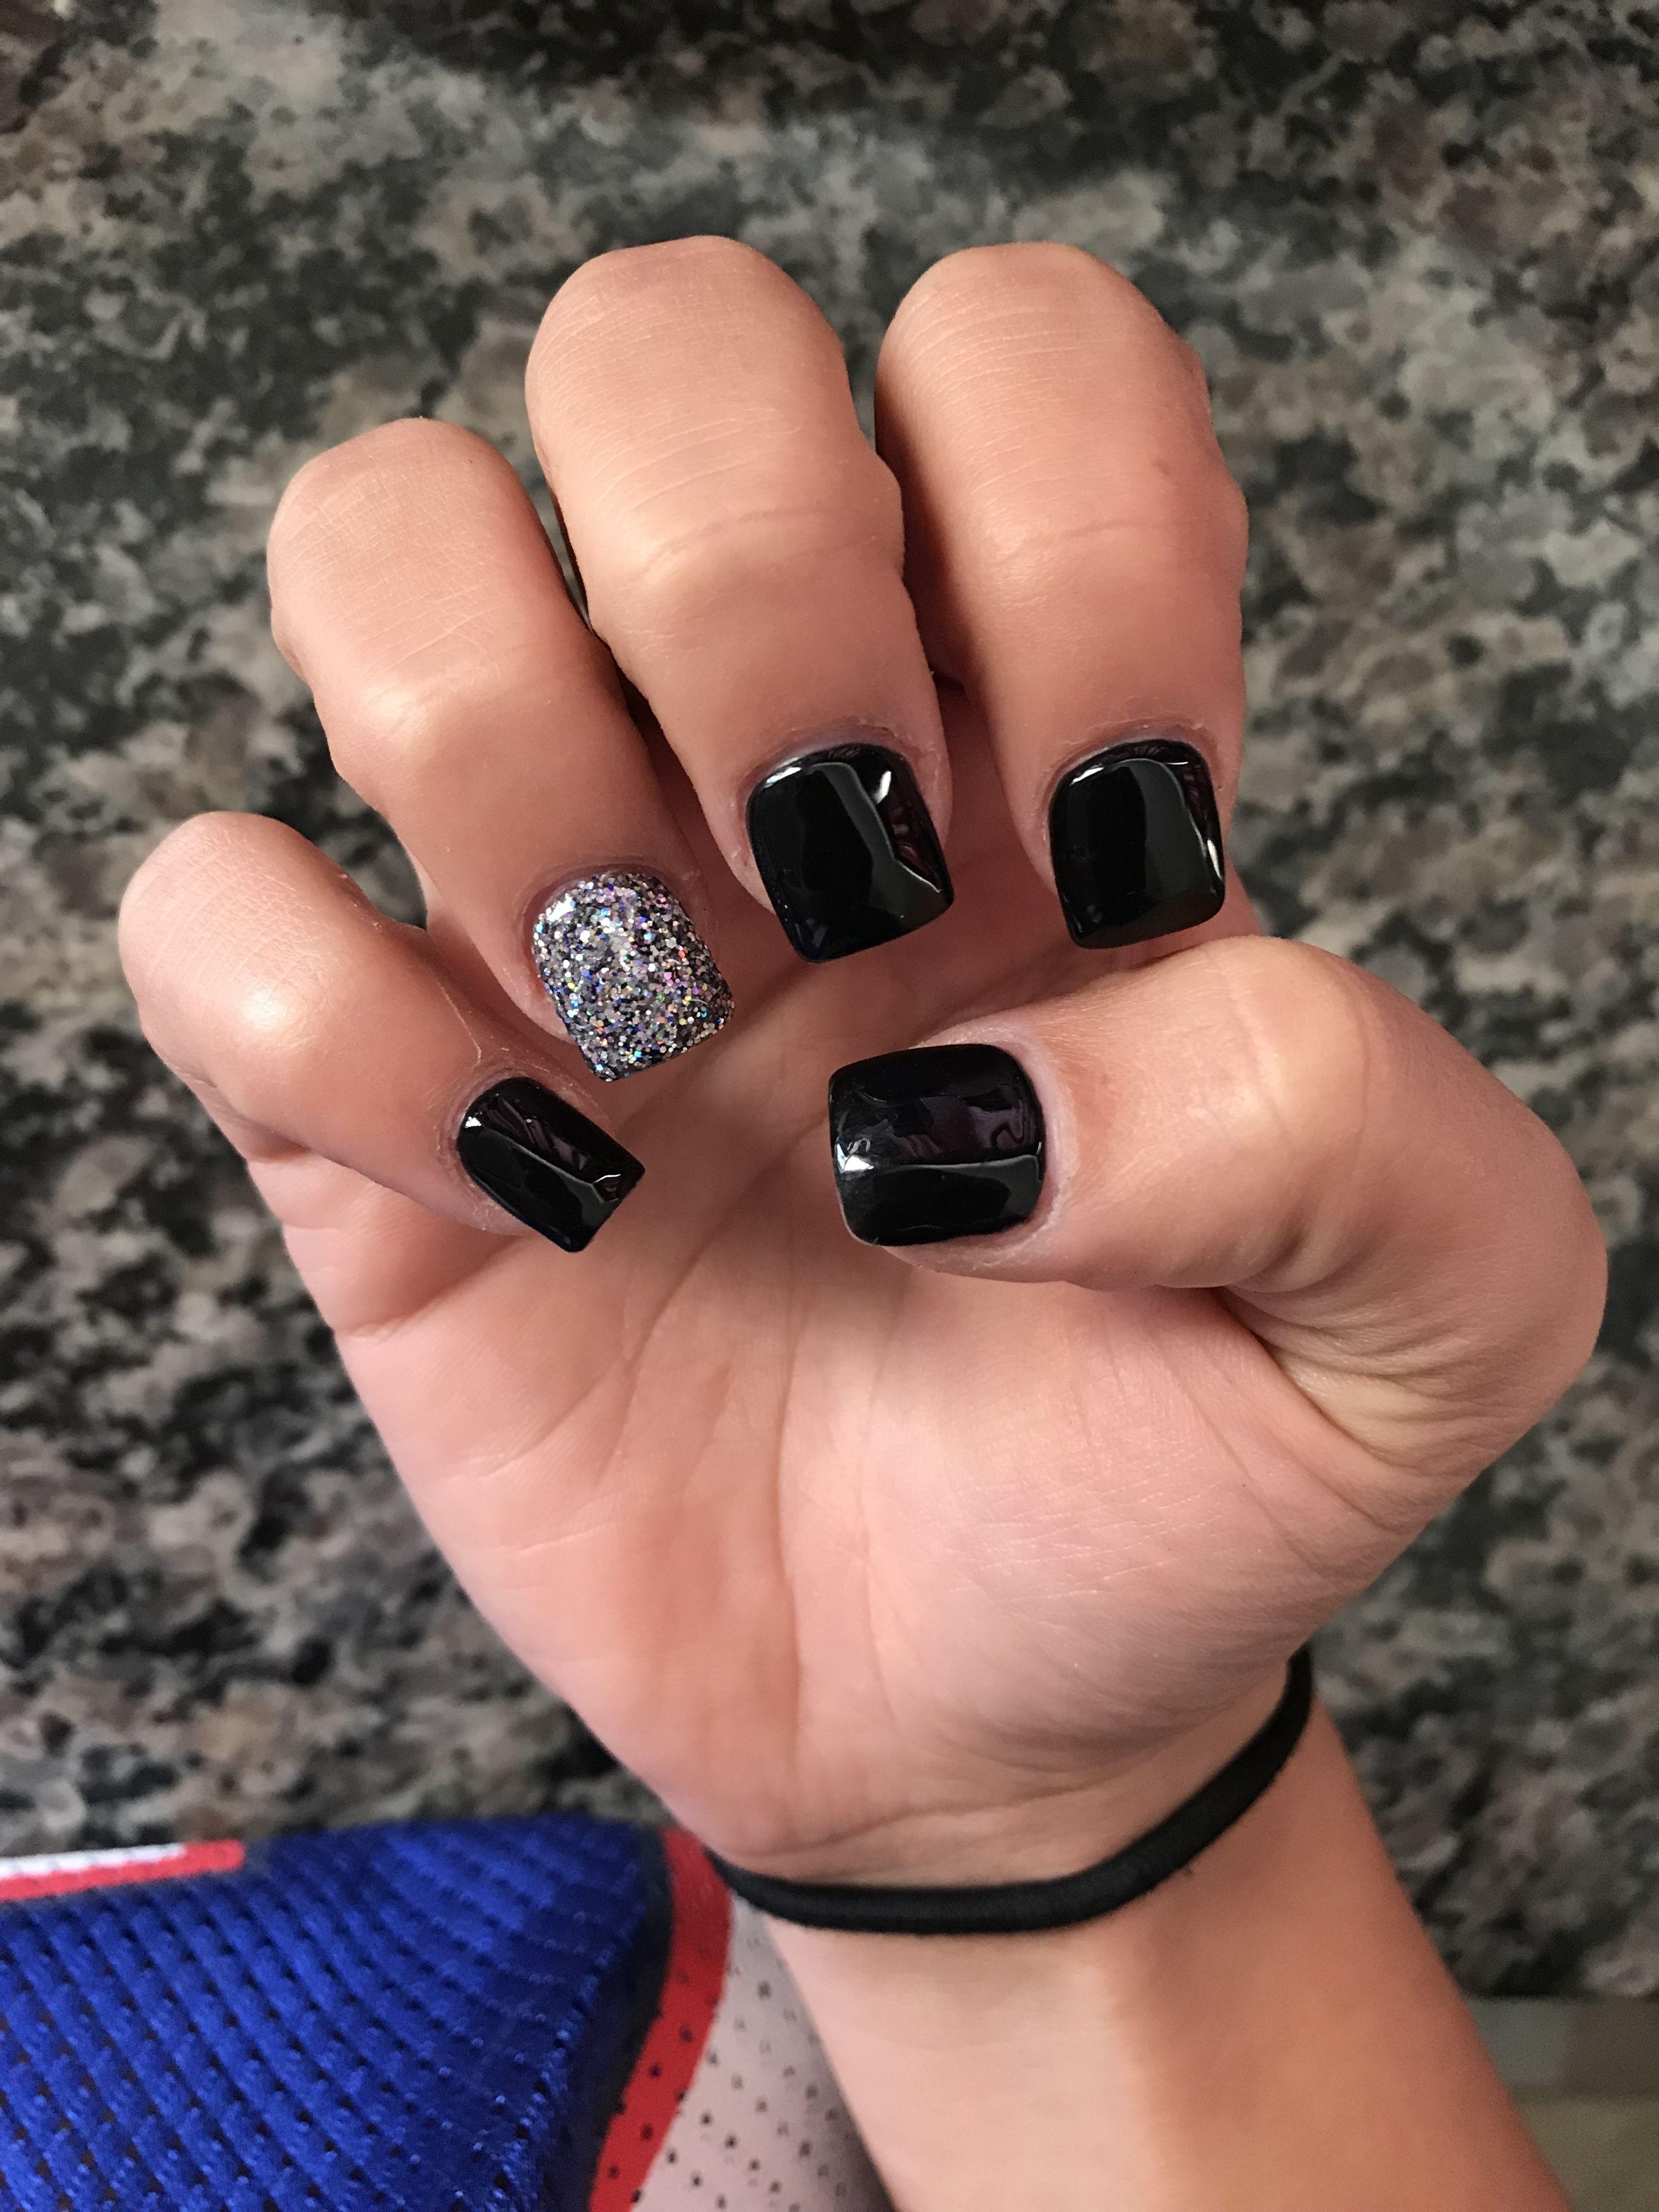 Pin de Ashley Pimentel en nails   Pinterest   Diseños de uñas ...